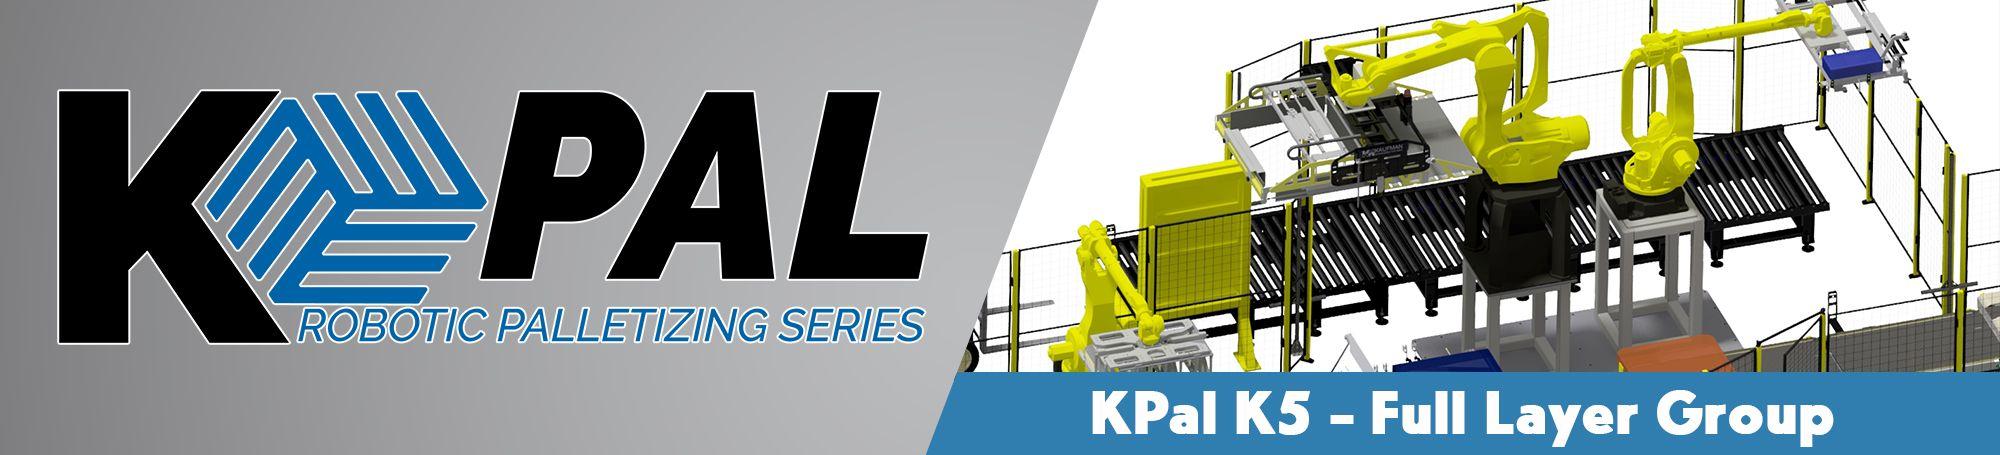 KPAL全层组2.jpg